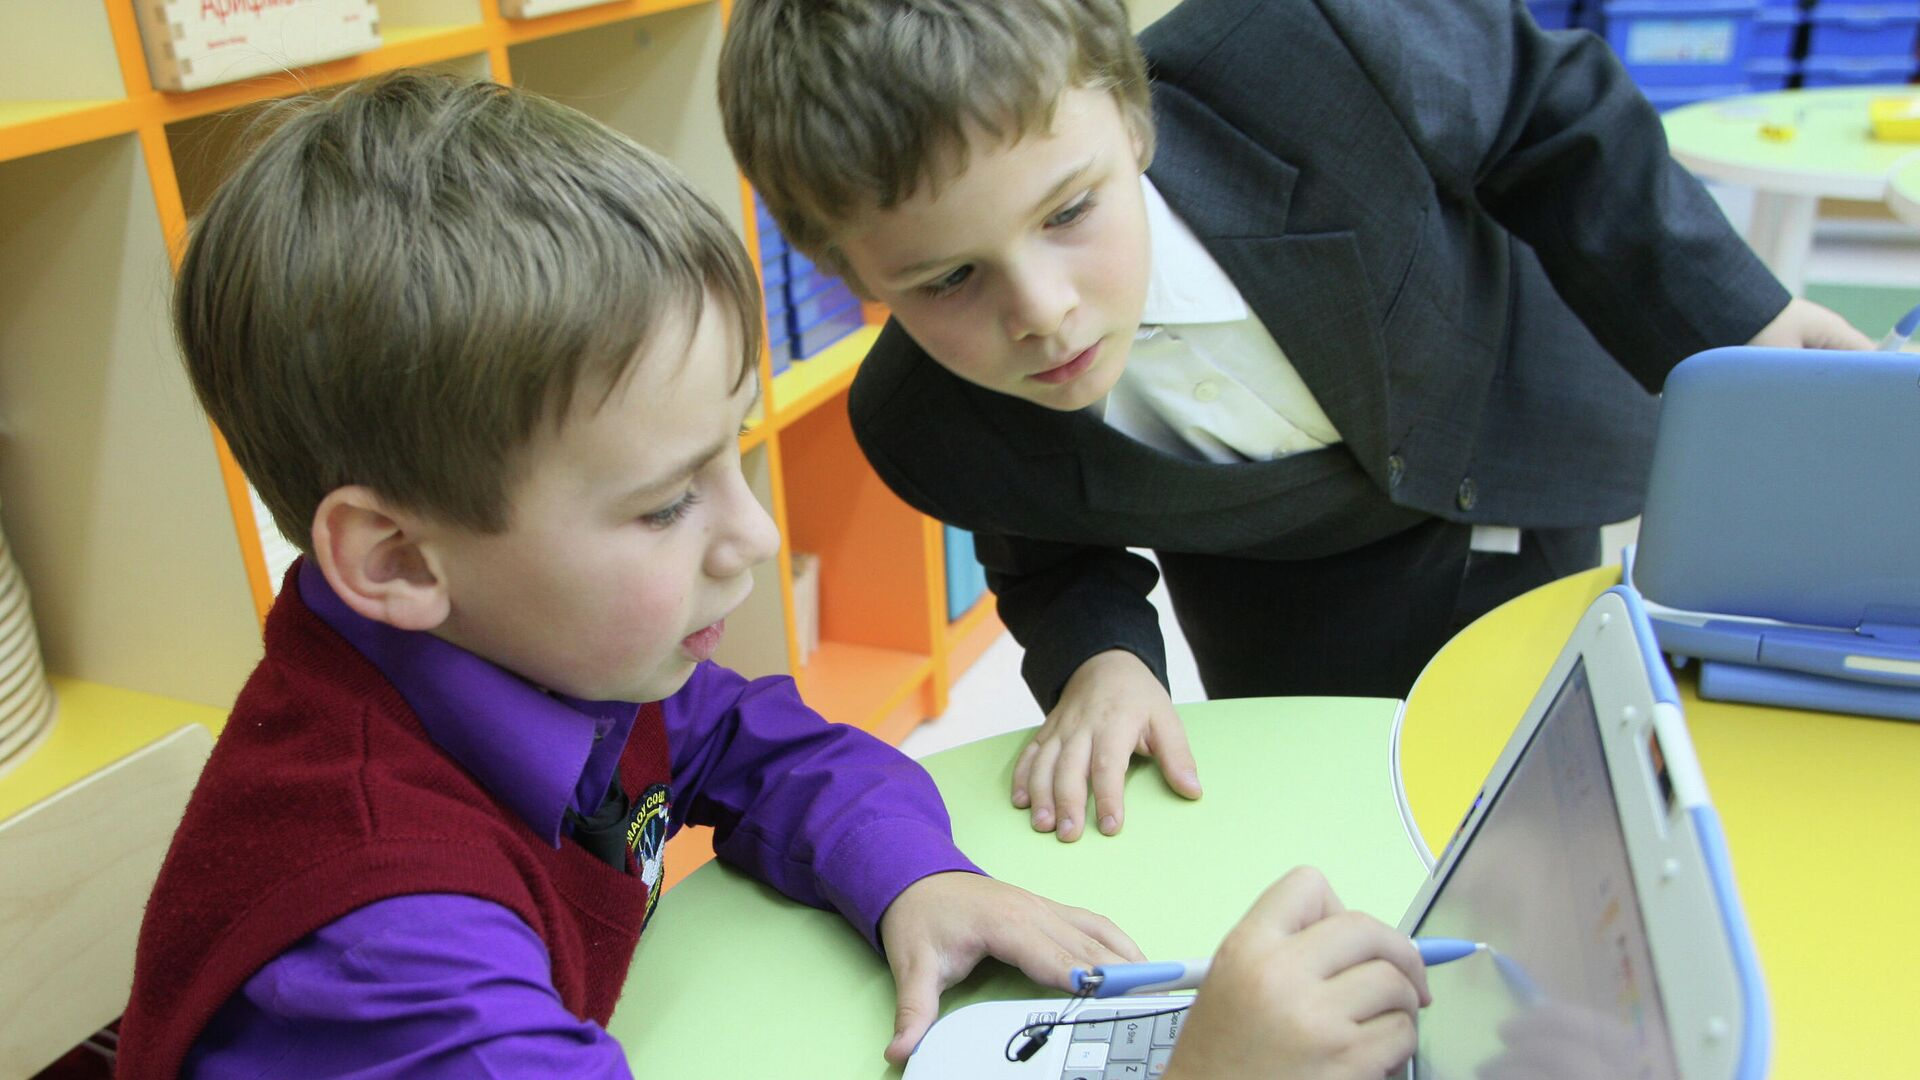 1572189501 0:0:2835:1595 1920x0 80 0 0 c836aa79f03adc9dec1506fa2907633a - Правительство одобрило проект о защите детей от вредоносной информации